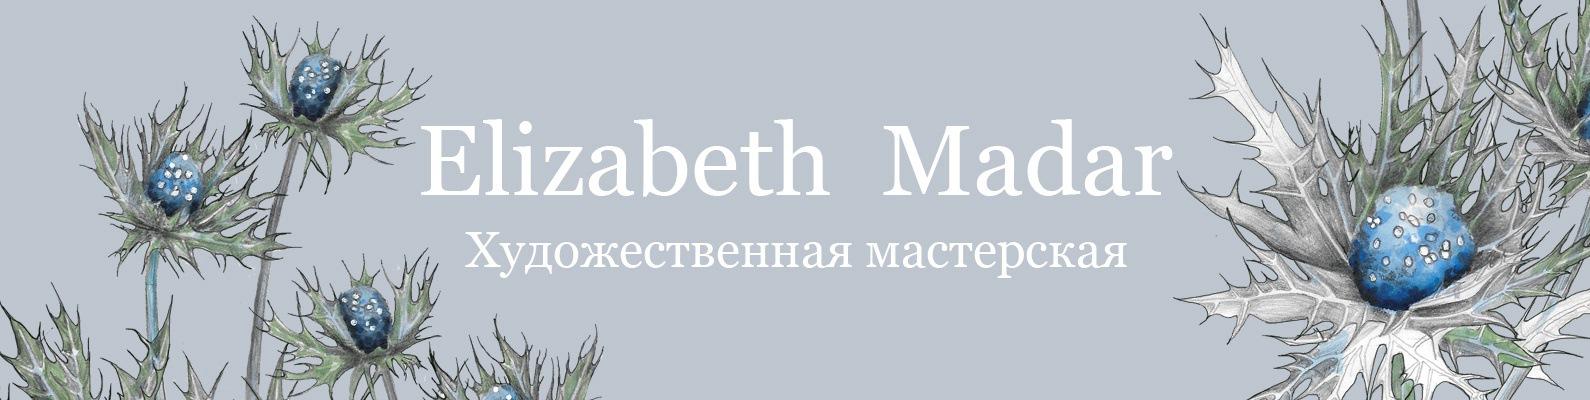 519c0681f3fa Elizabeth Madar | ВКонтакте